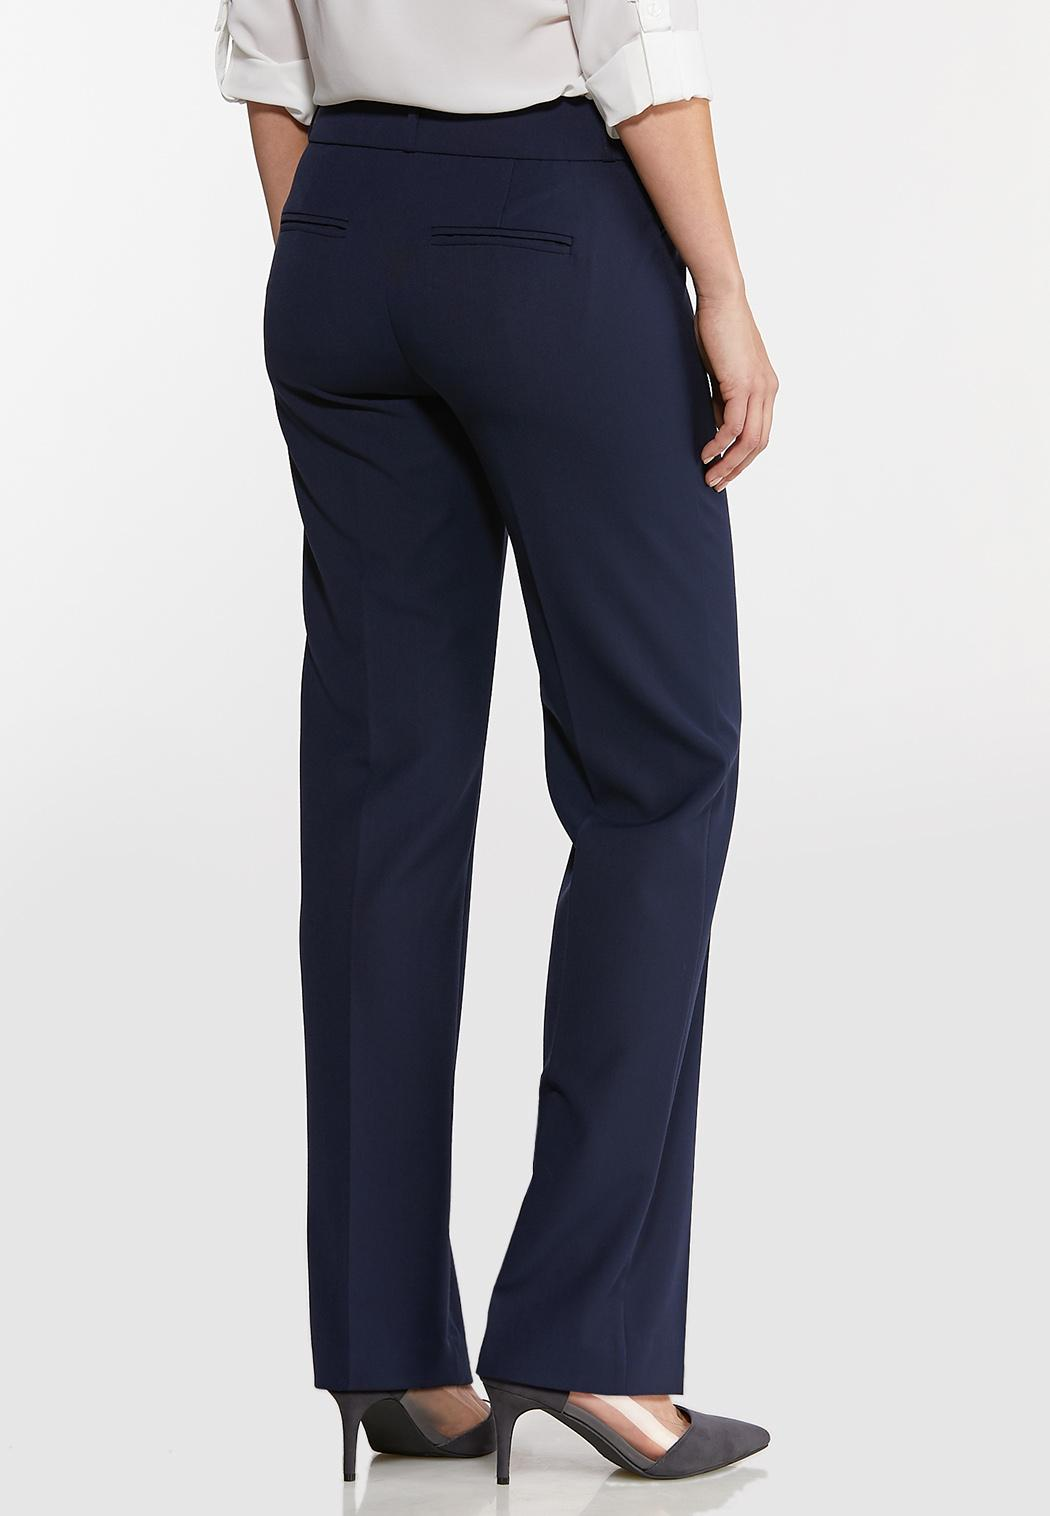 Petite Solid Trouser Pants (Item #44108820)